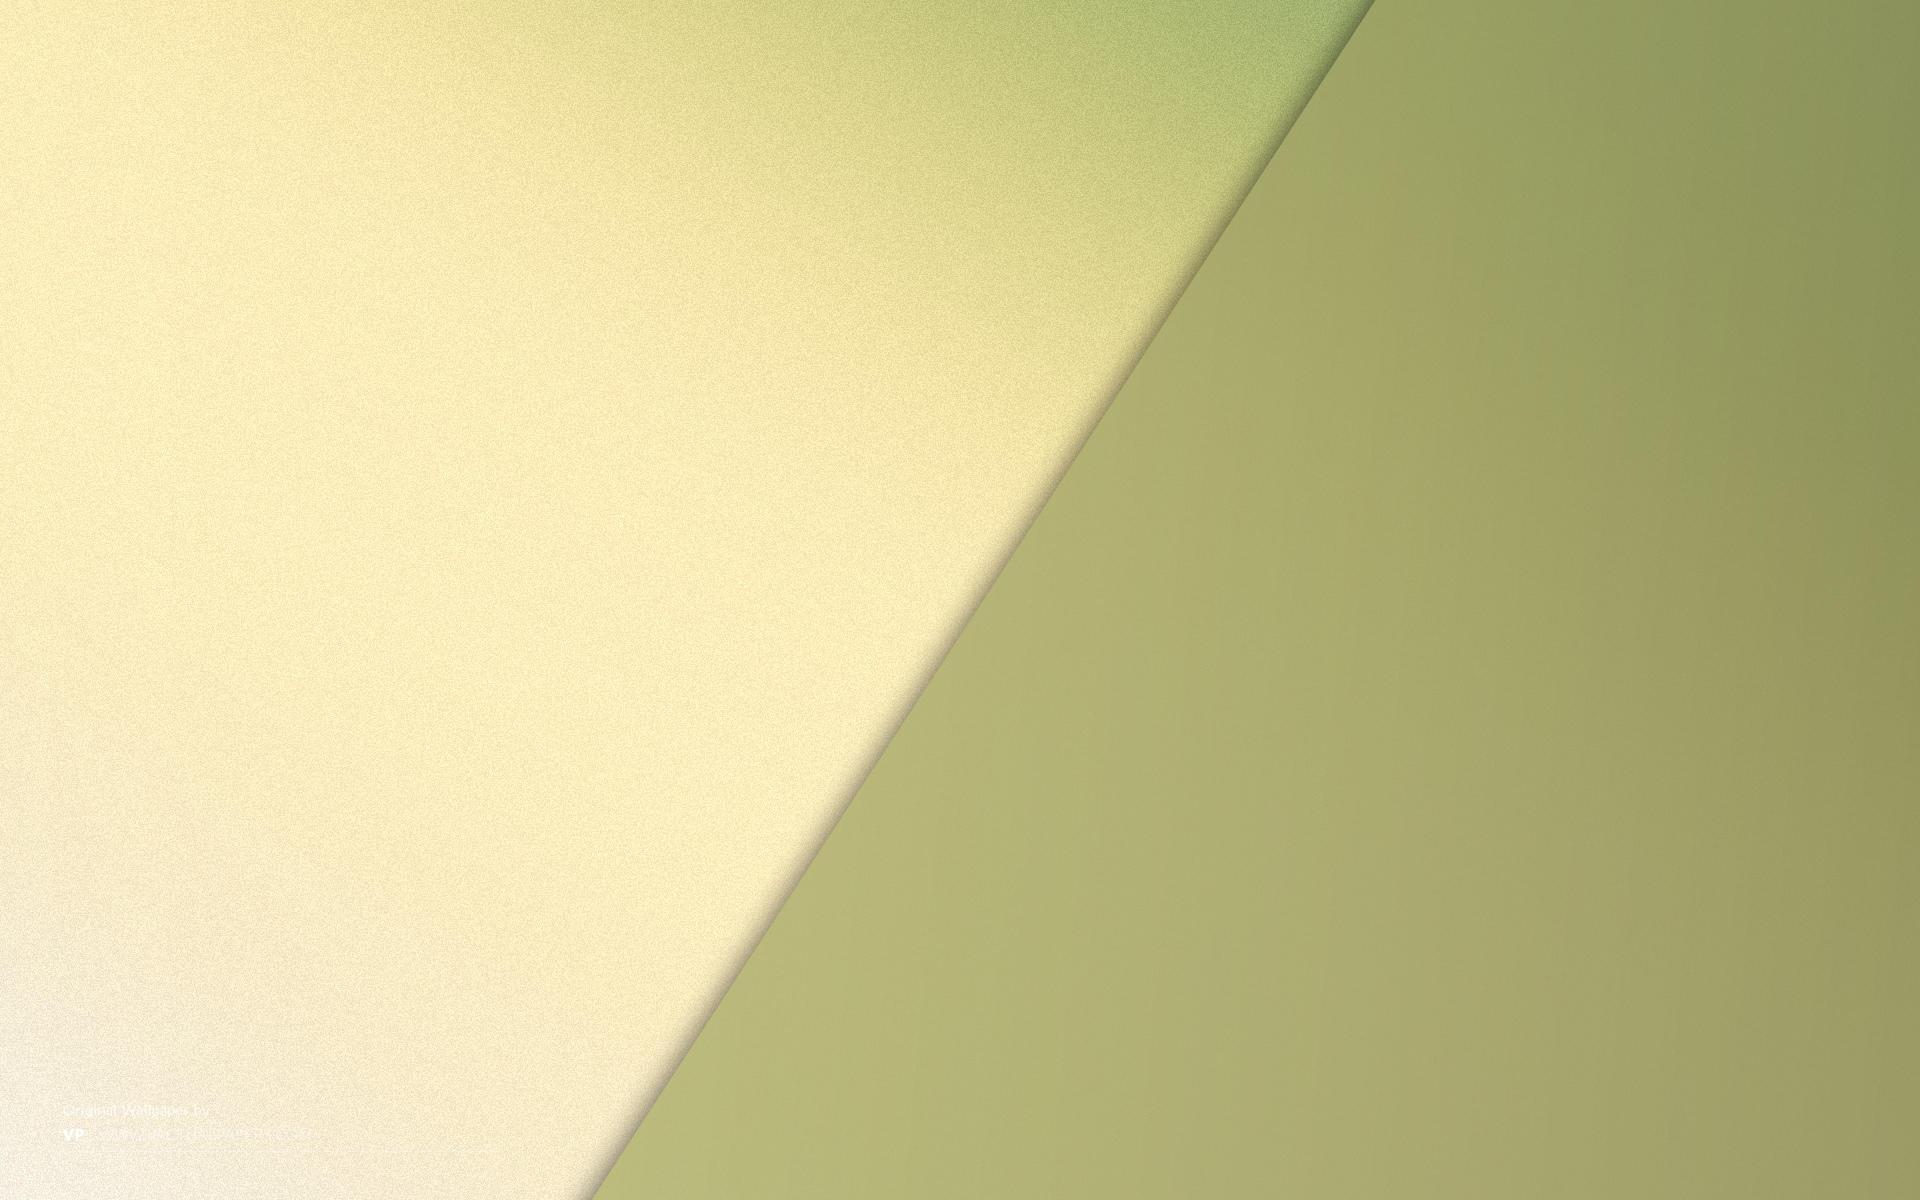 Обои болотный, exclus, shaded, hd-wallpaper-1920x120